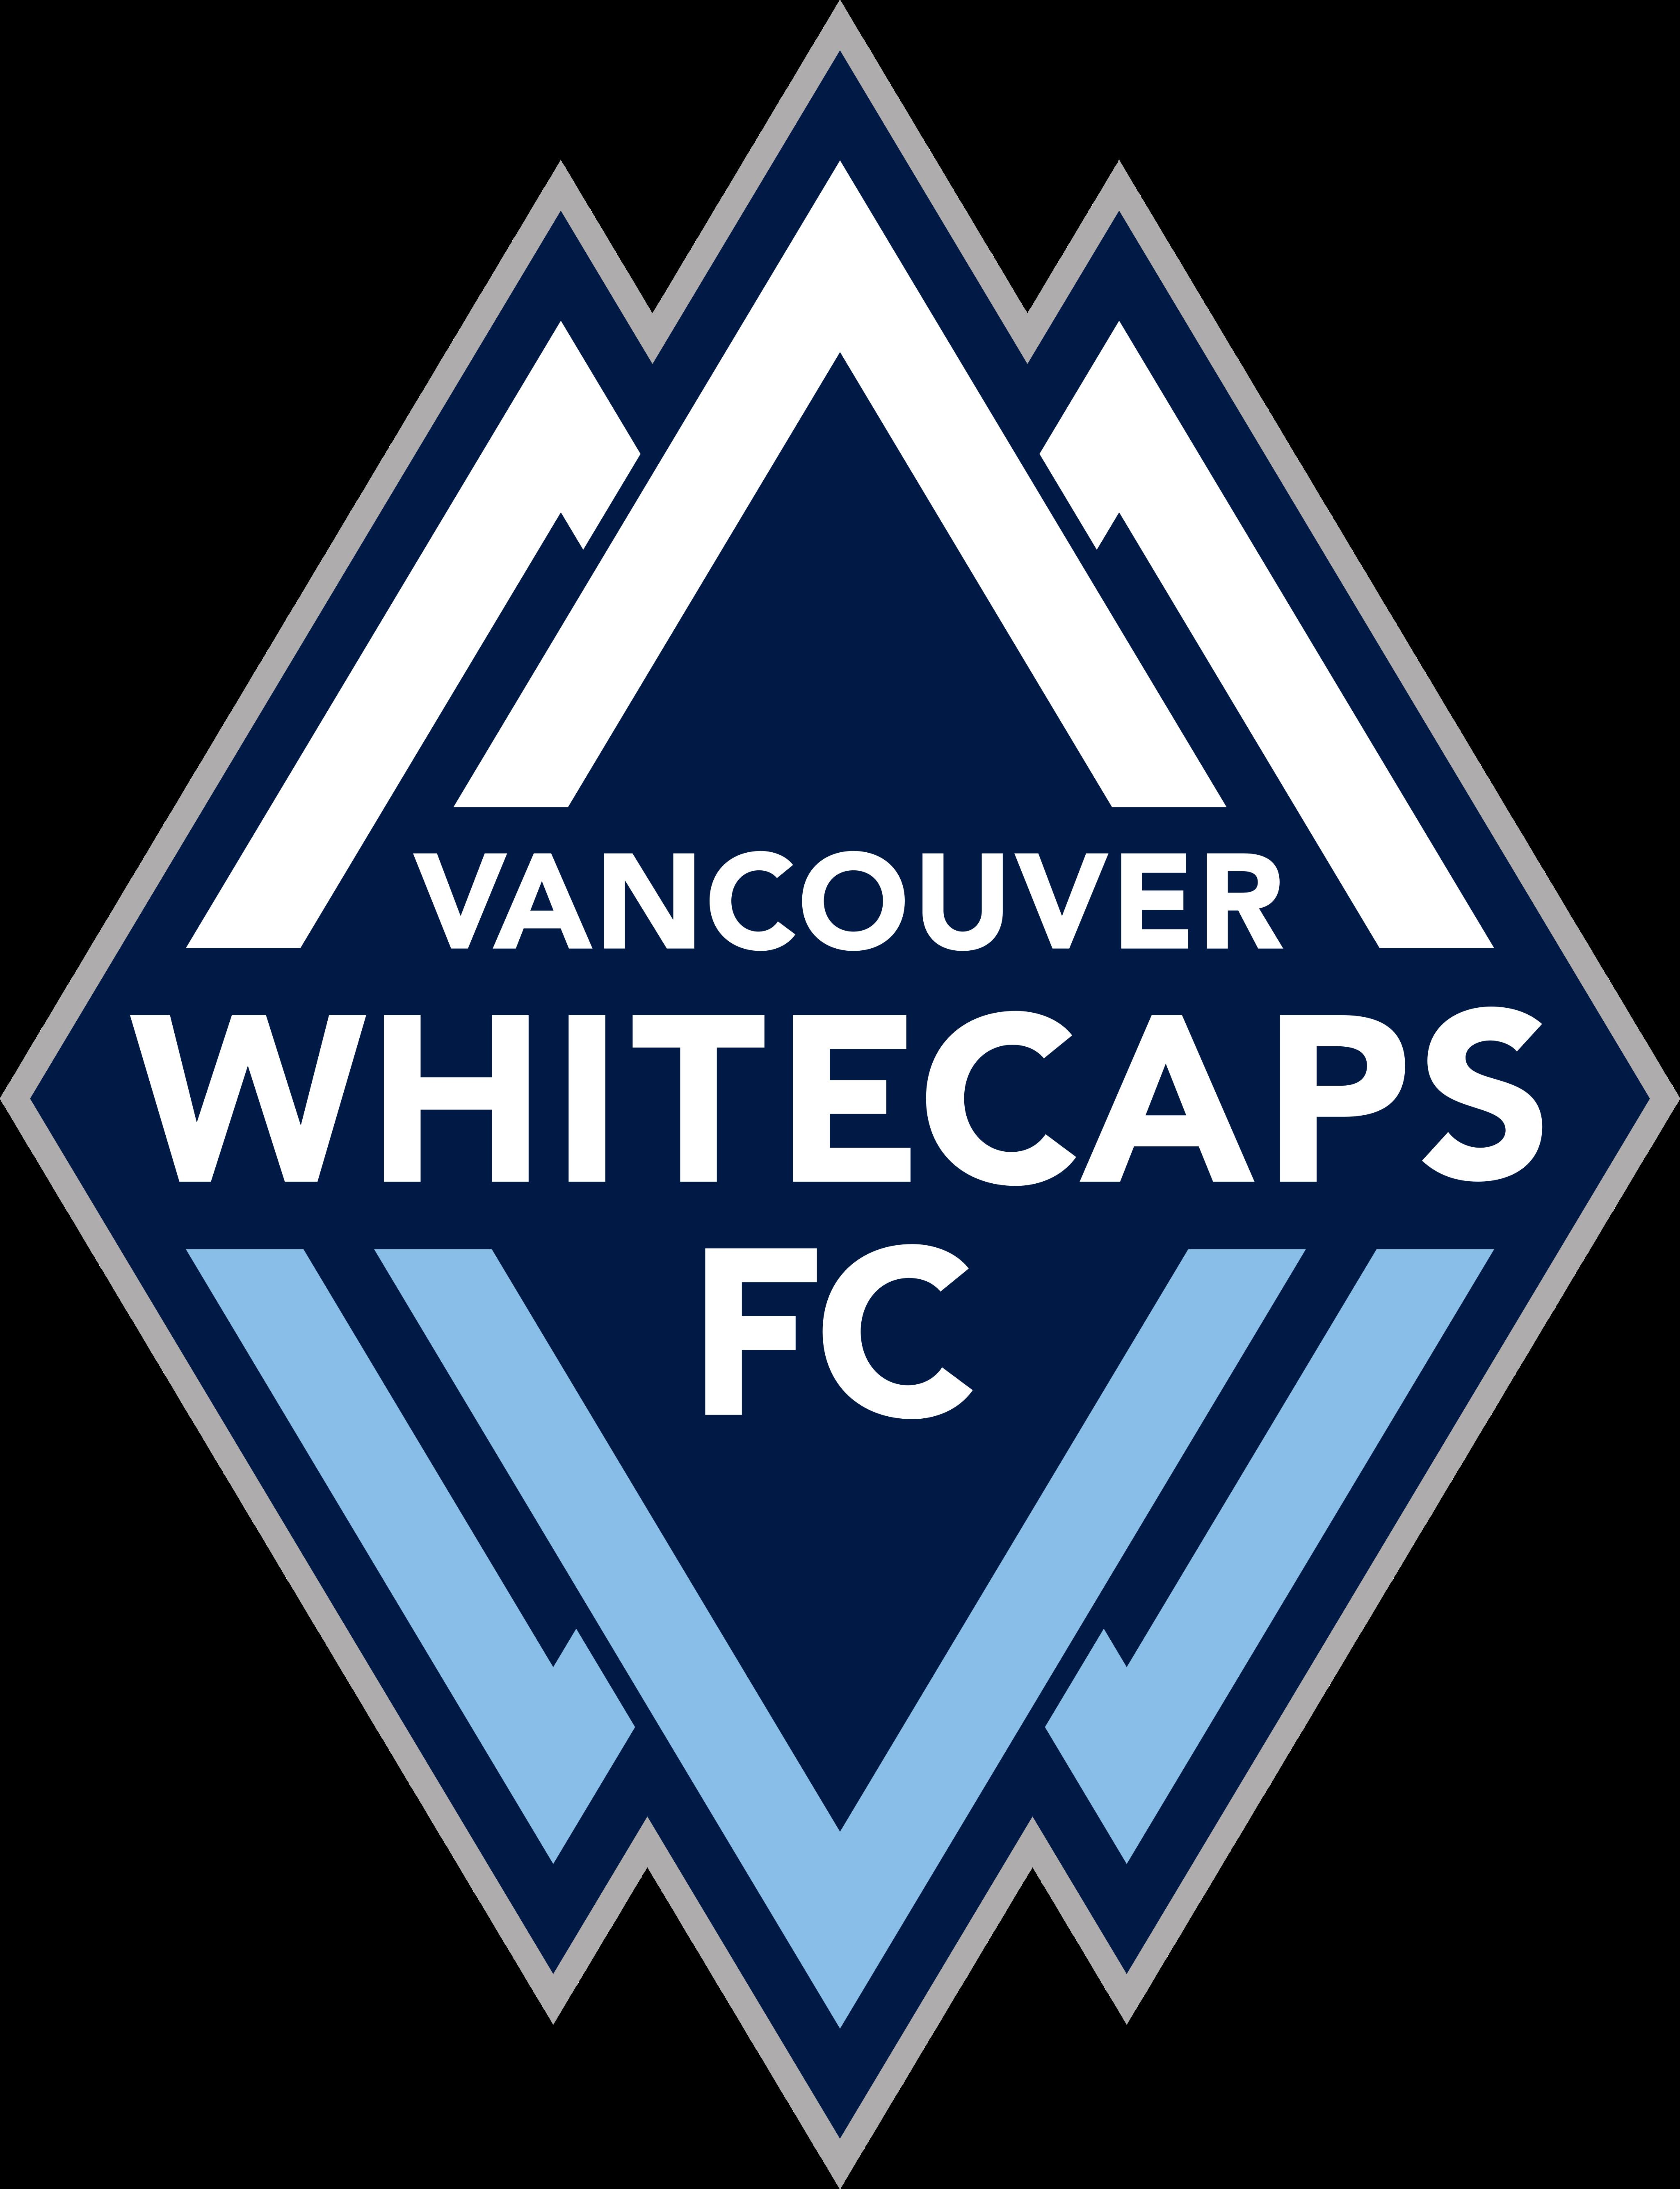 Vancouver Whitecaps FC Logo.